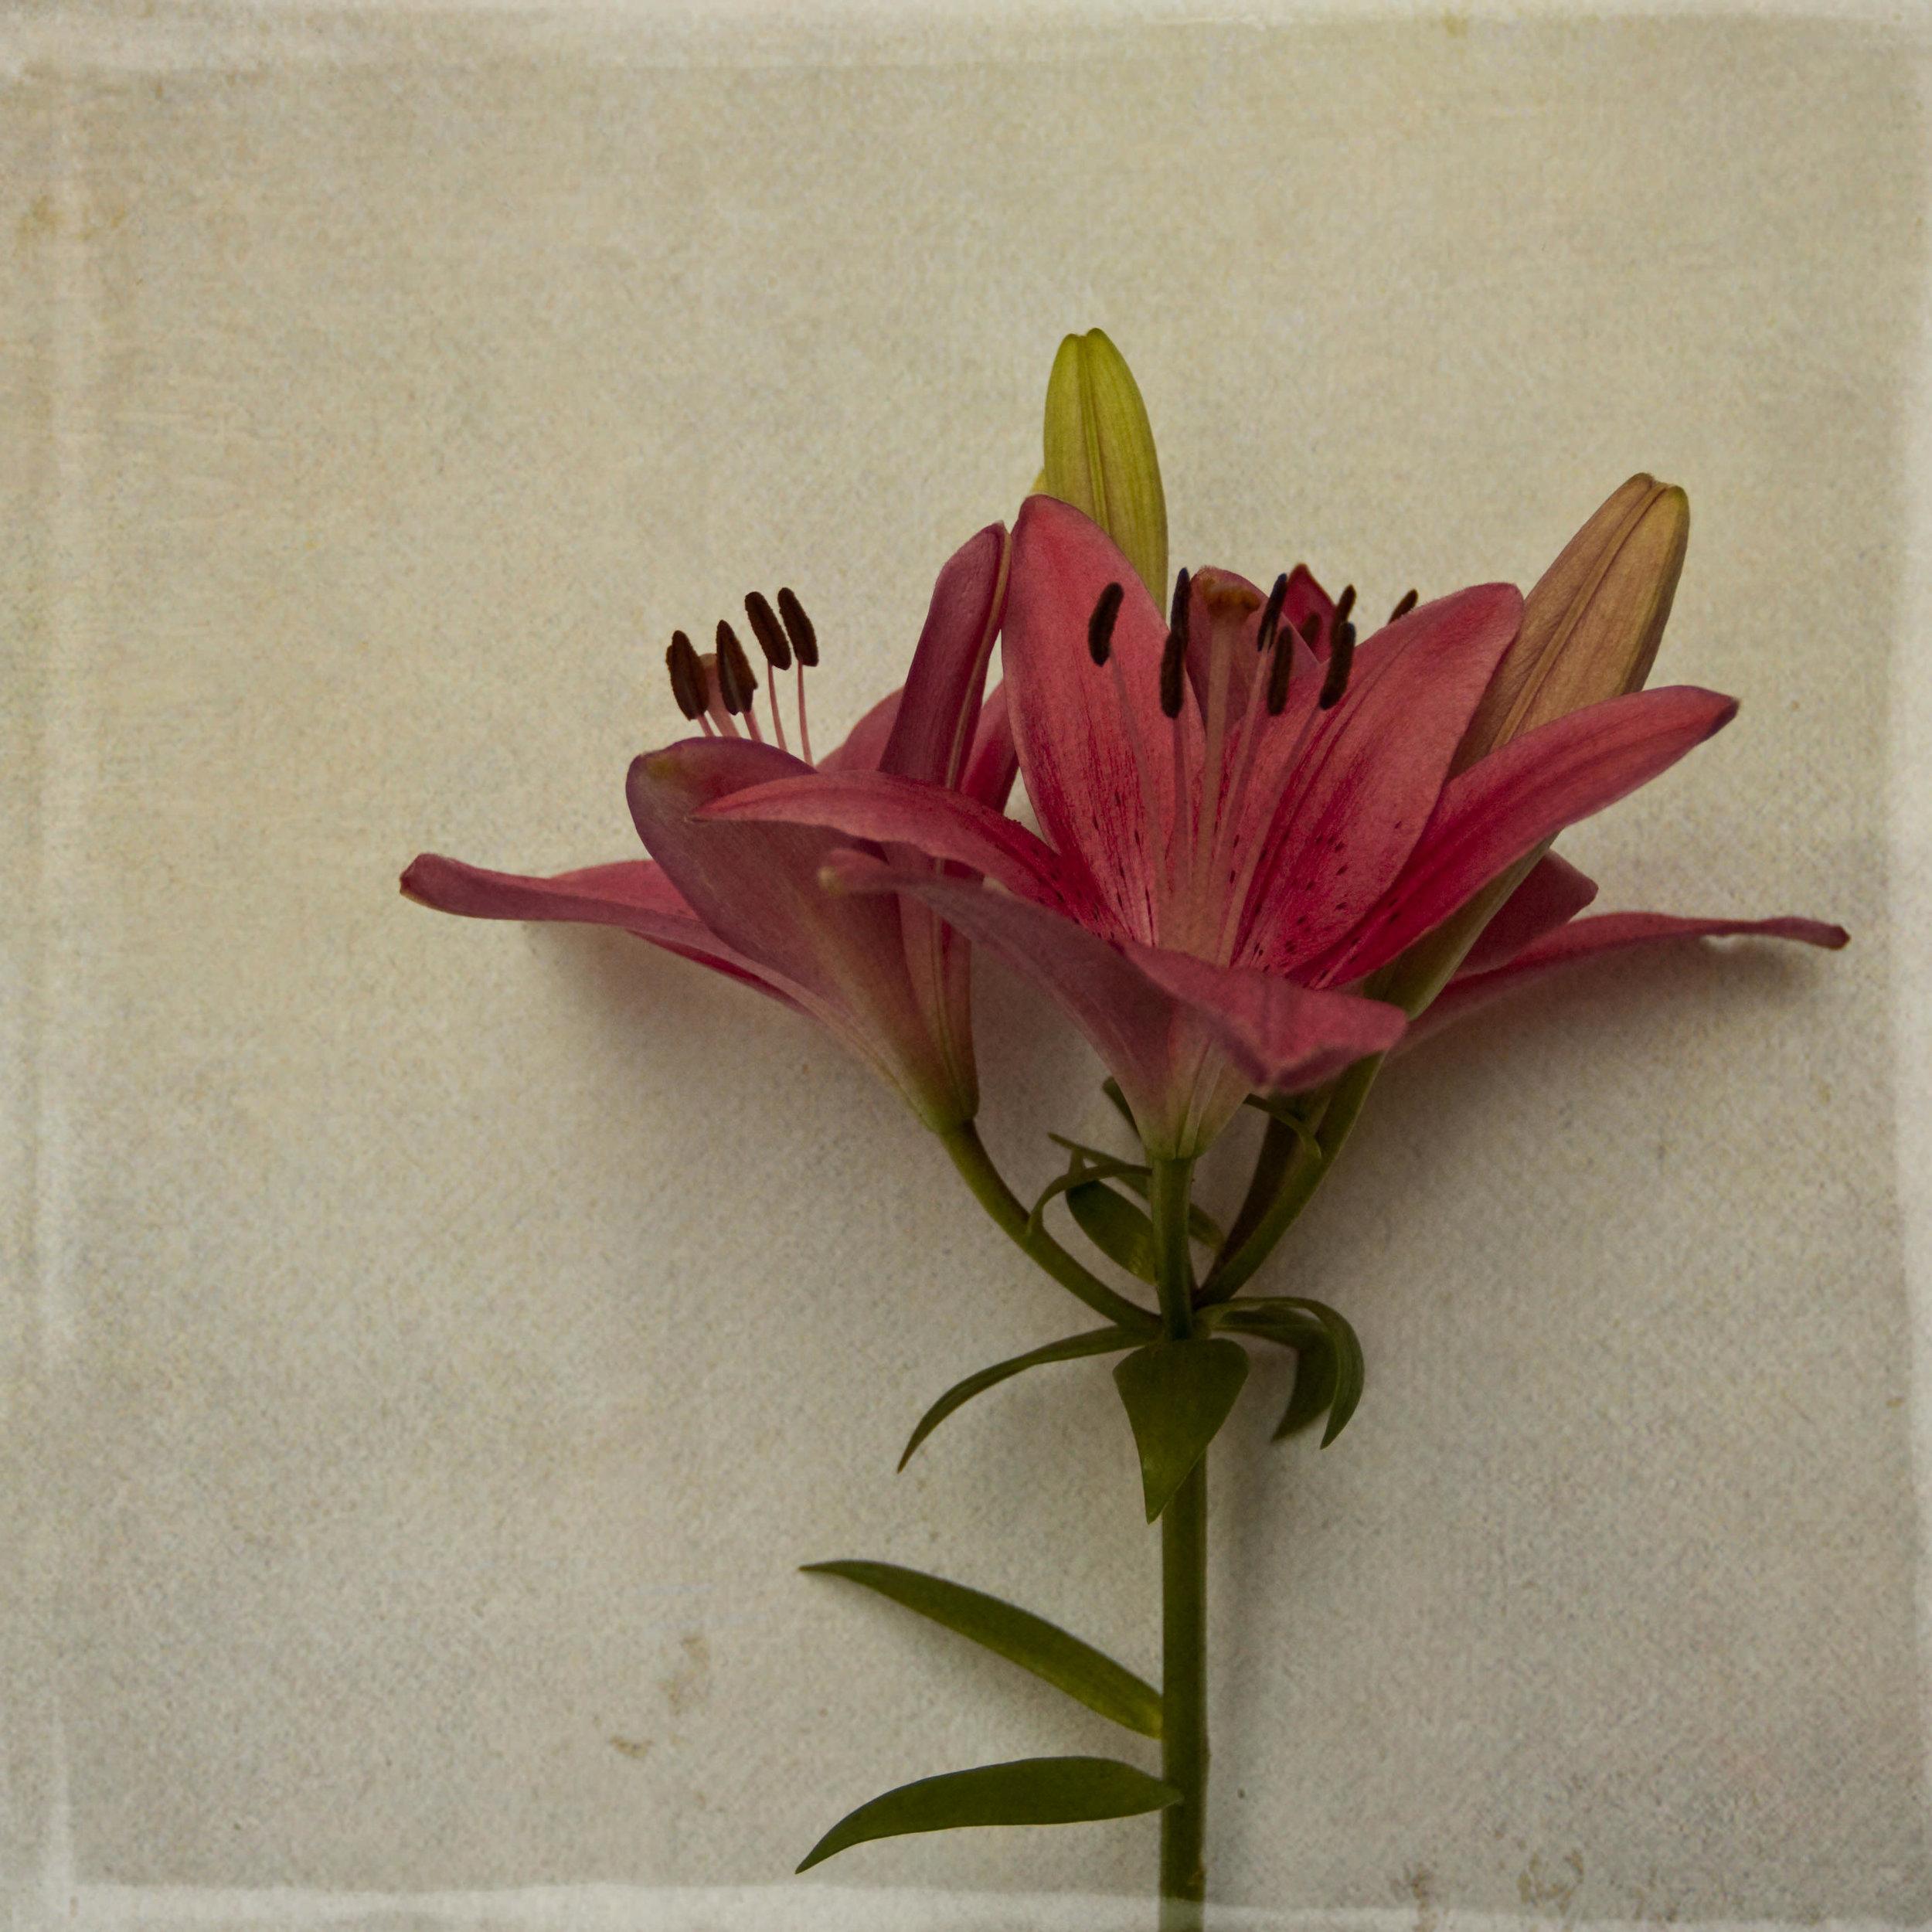 lily-7832.jpg